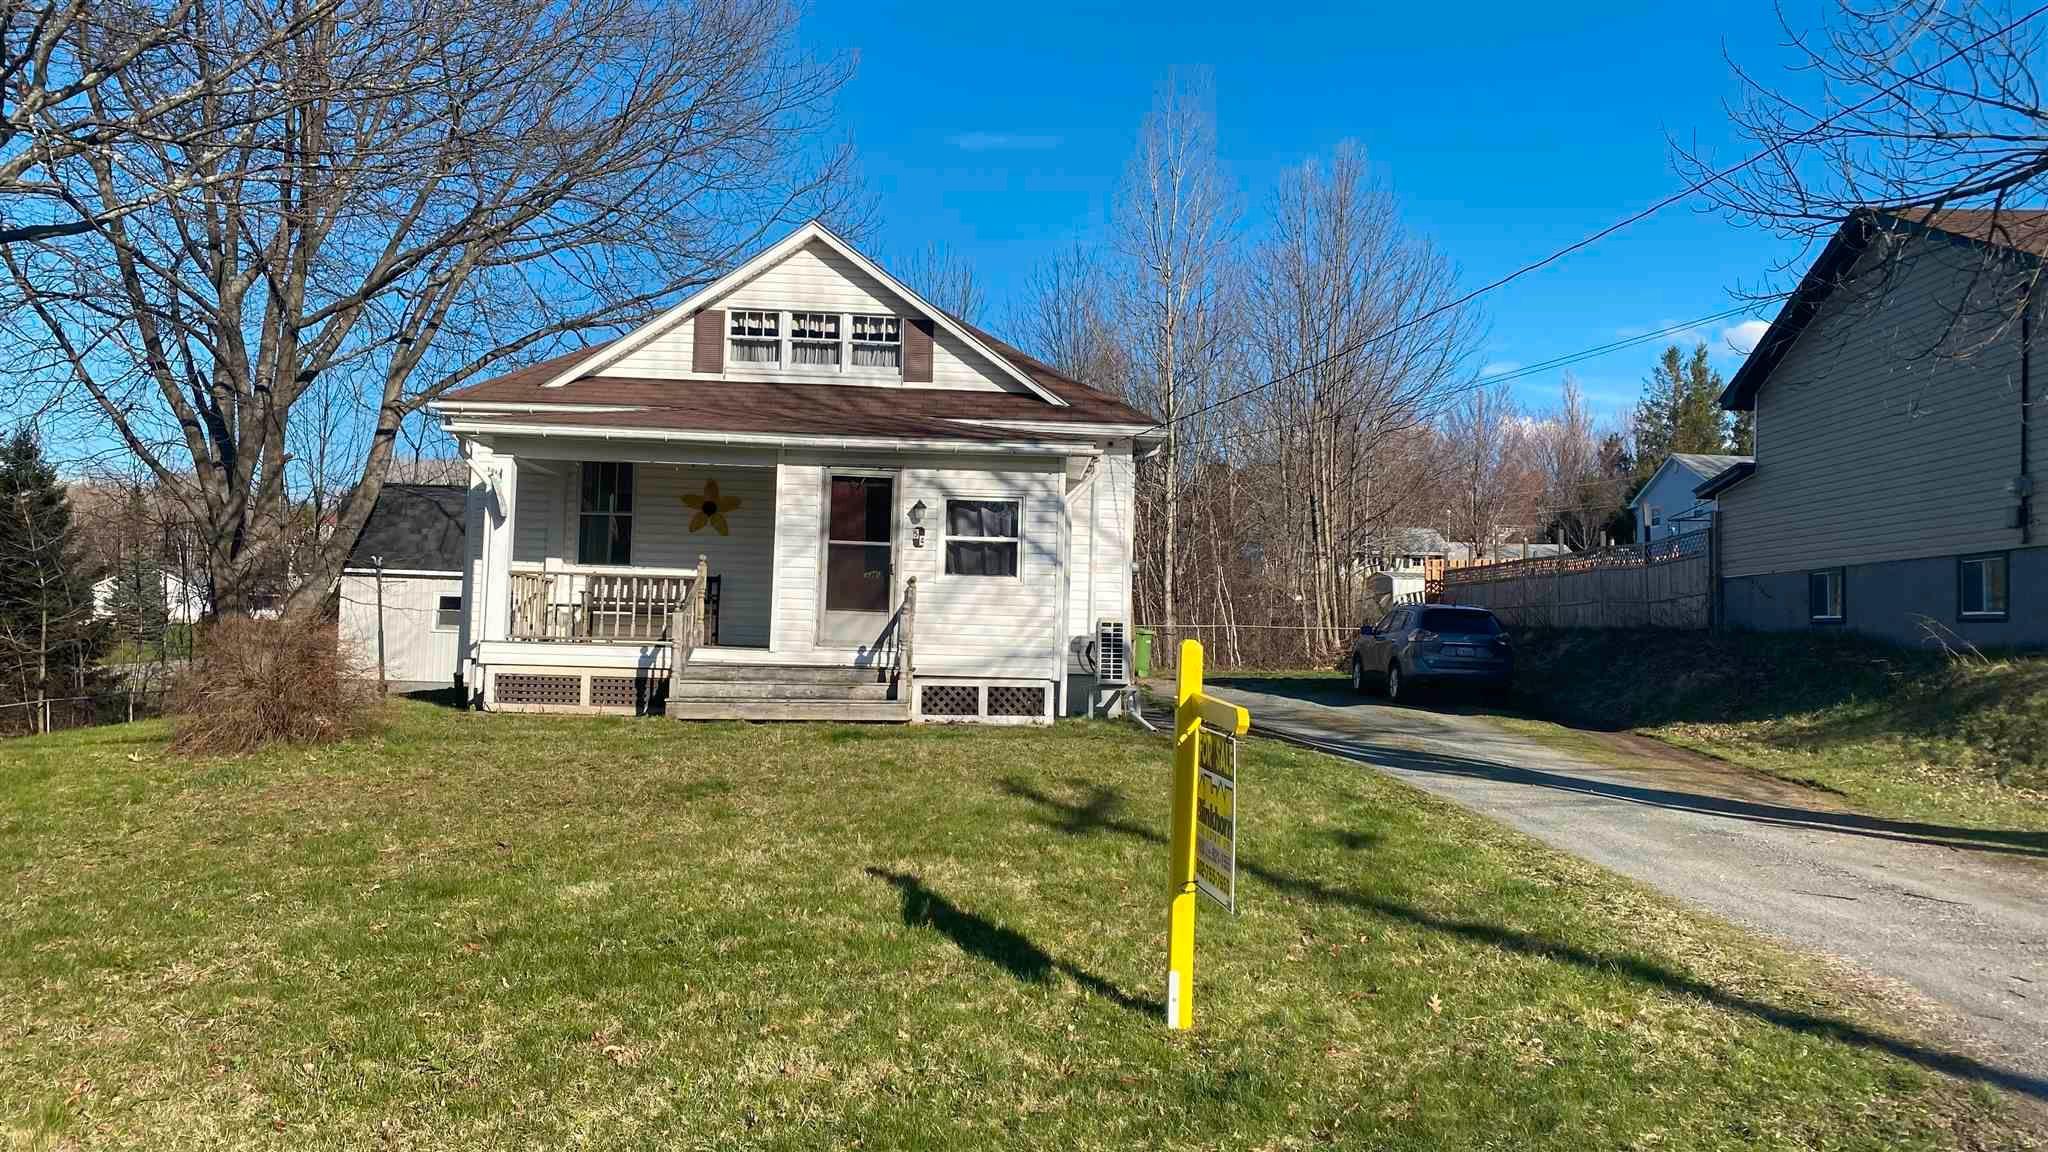 Main Photo: 54 Seventh Street in Trenton: 107-Trenton,Westville,Pictou Residential for sale (Northern Region)  : MLS®# 202110443